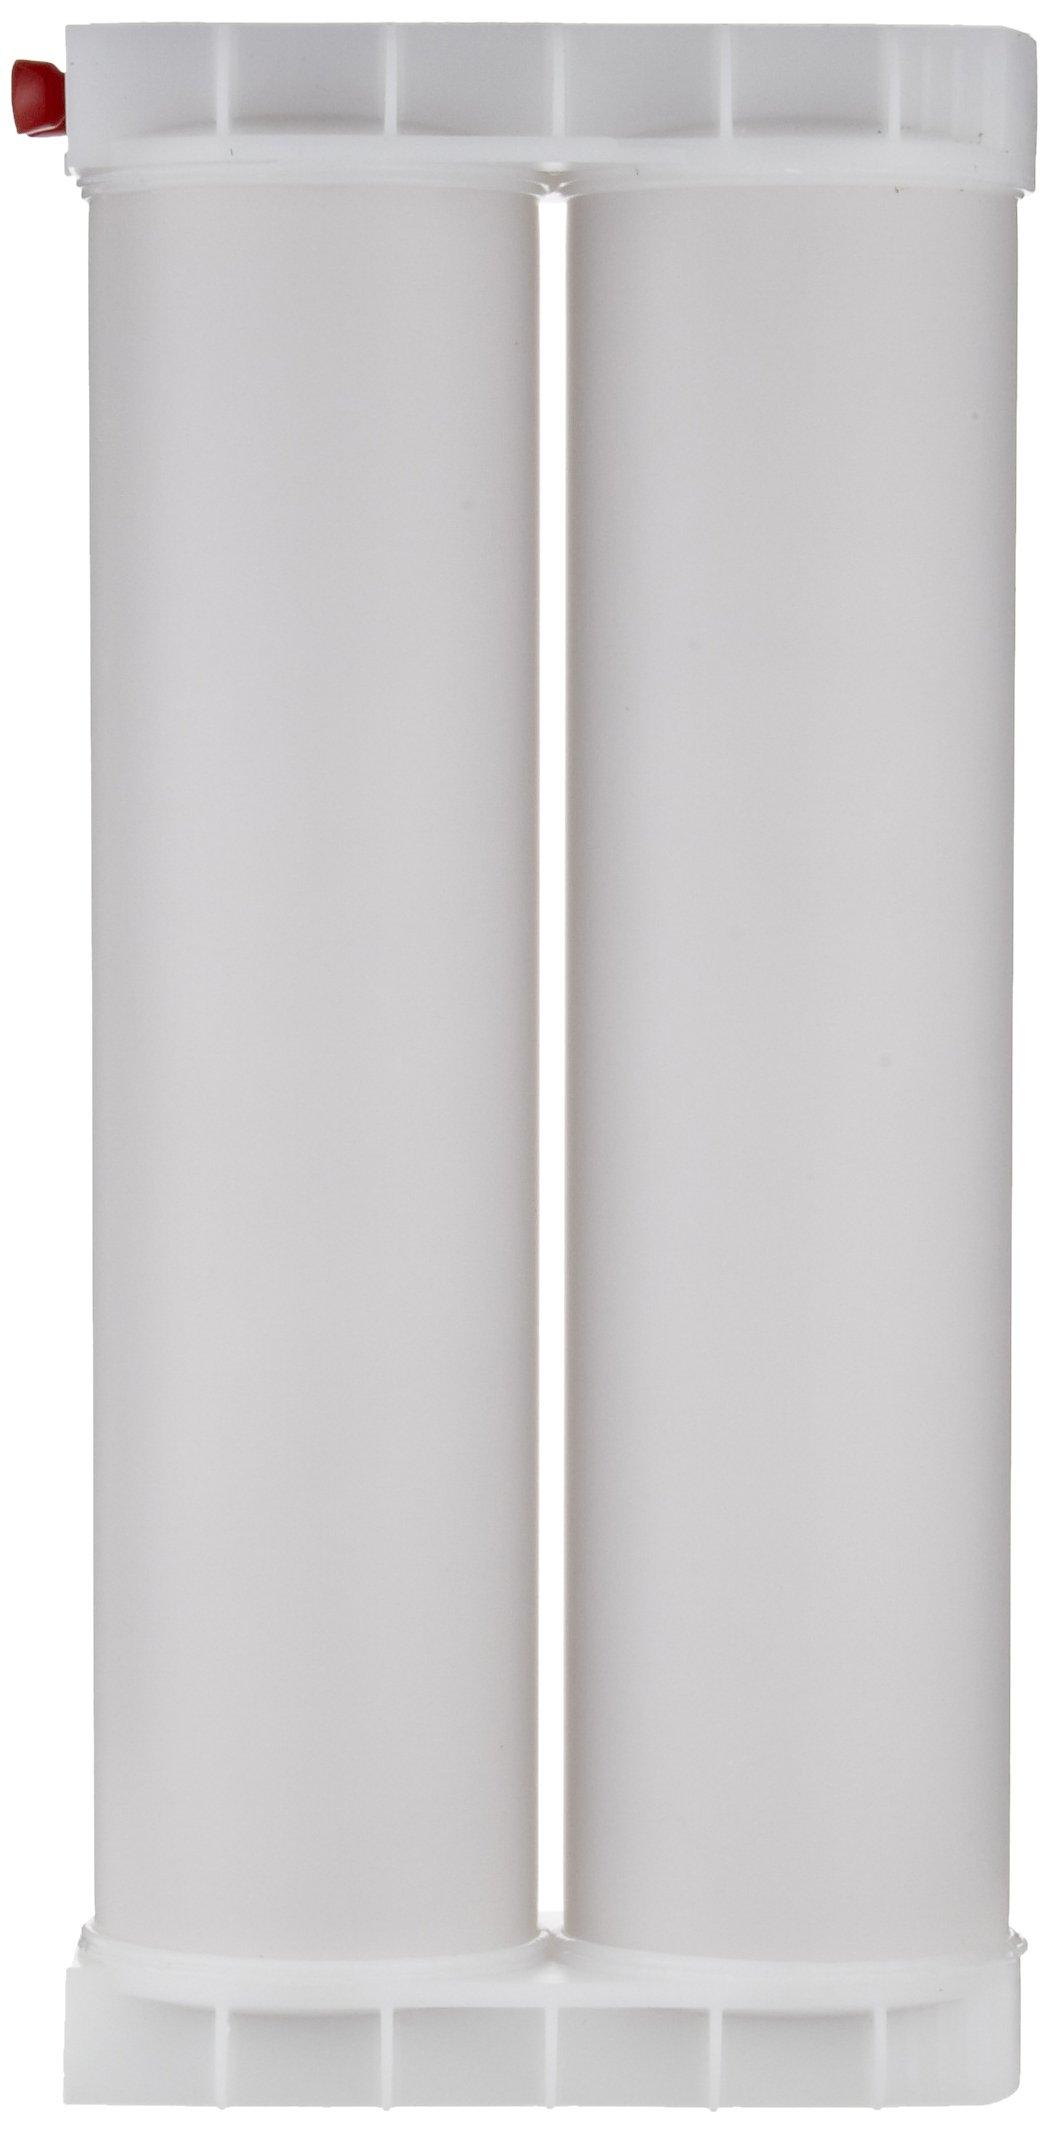 Elga LC141 Deionisation Cartridge, For Medica and Purelab by Elga